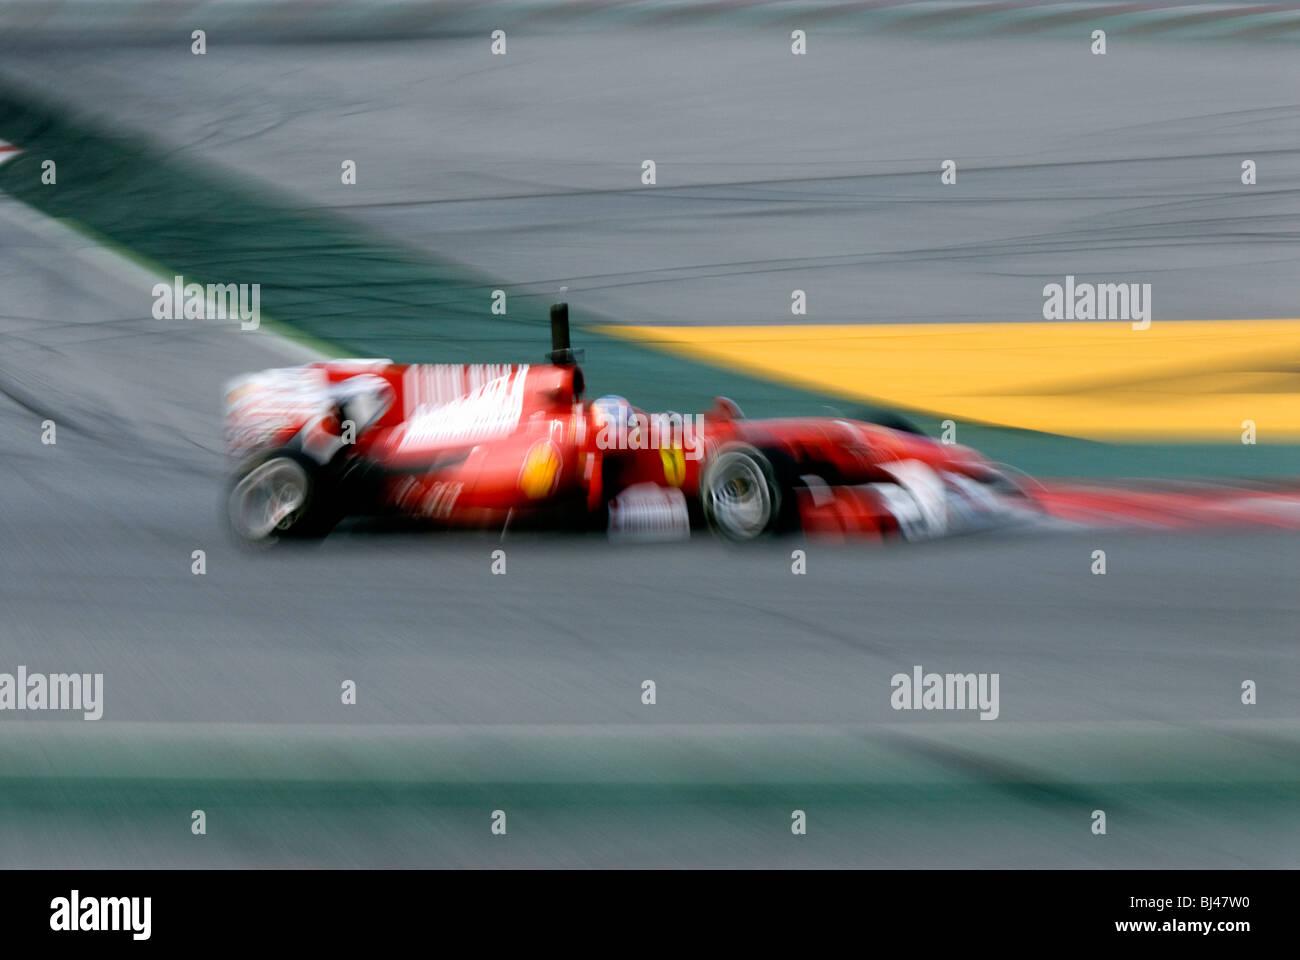 Feature, Formula 1 testing sessions at Circuit de Catalunya near Barcelona, Spain, 25.-28.2.2010. - Stock Image